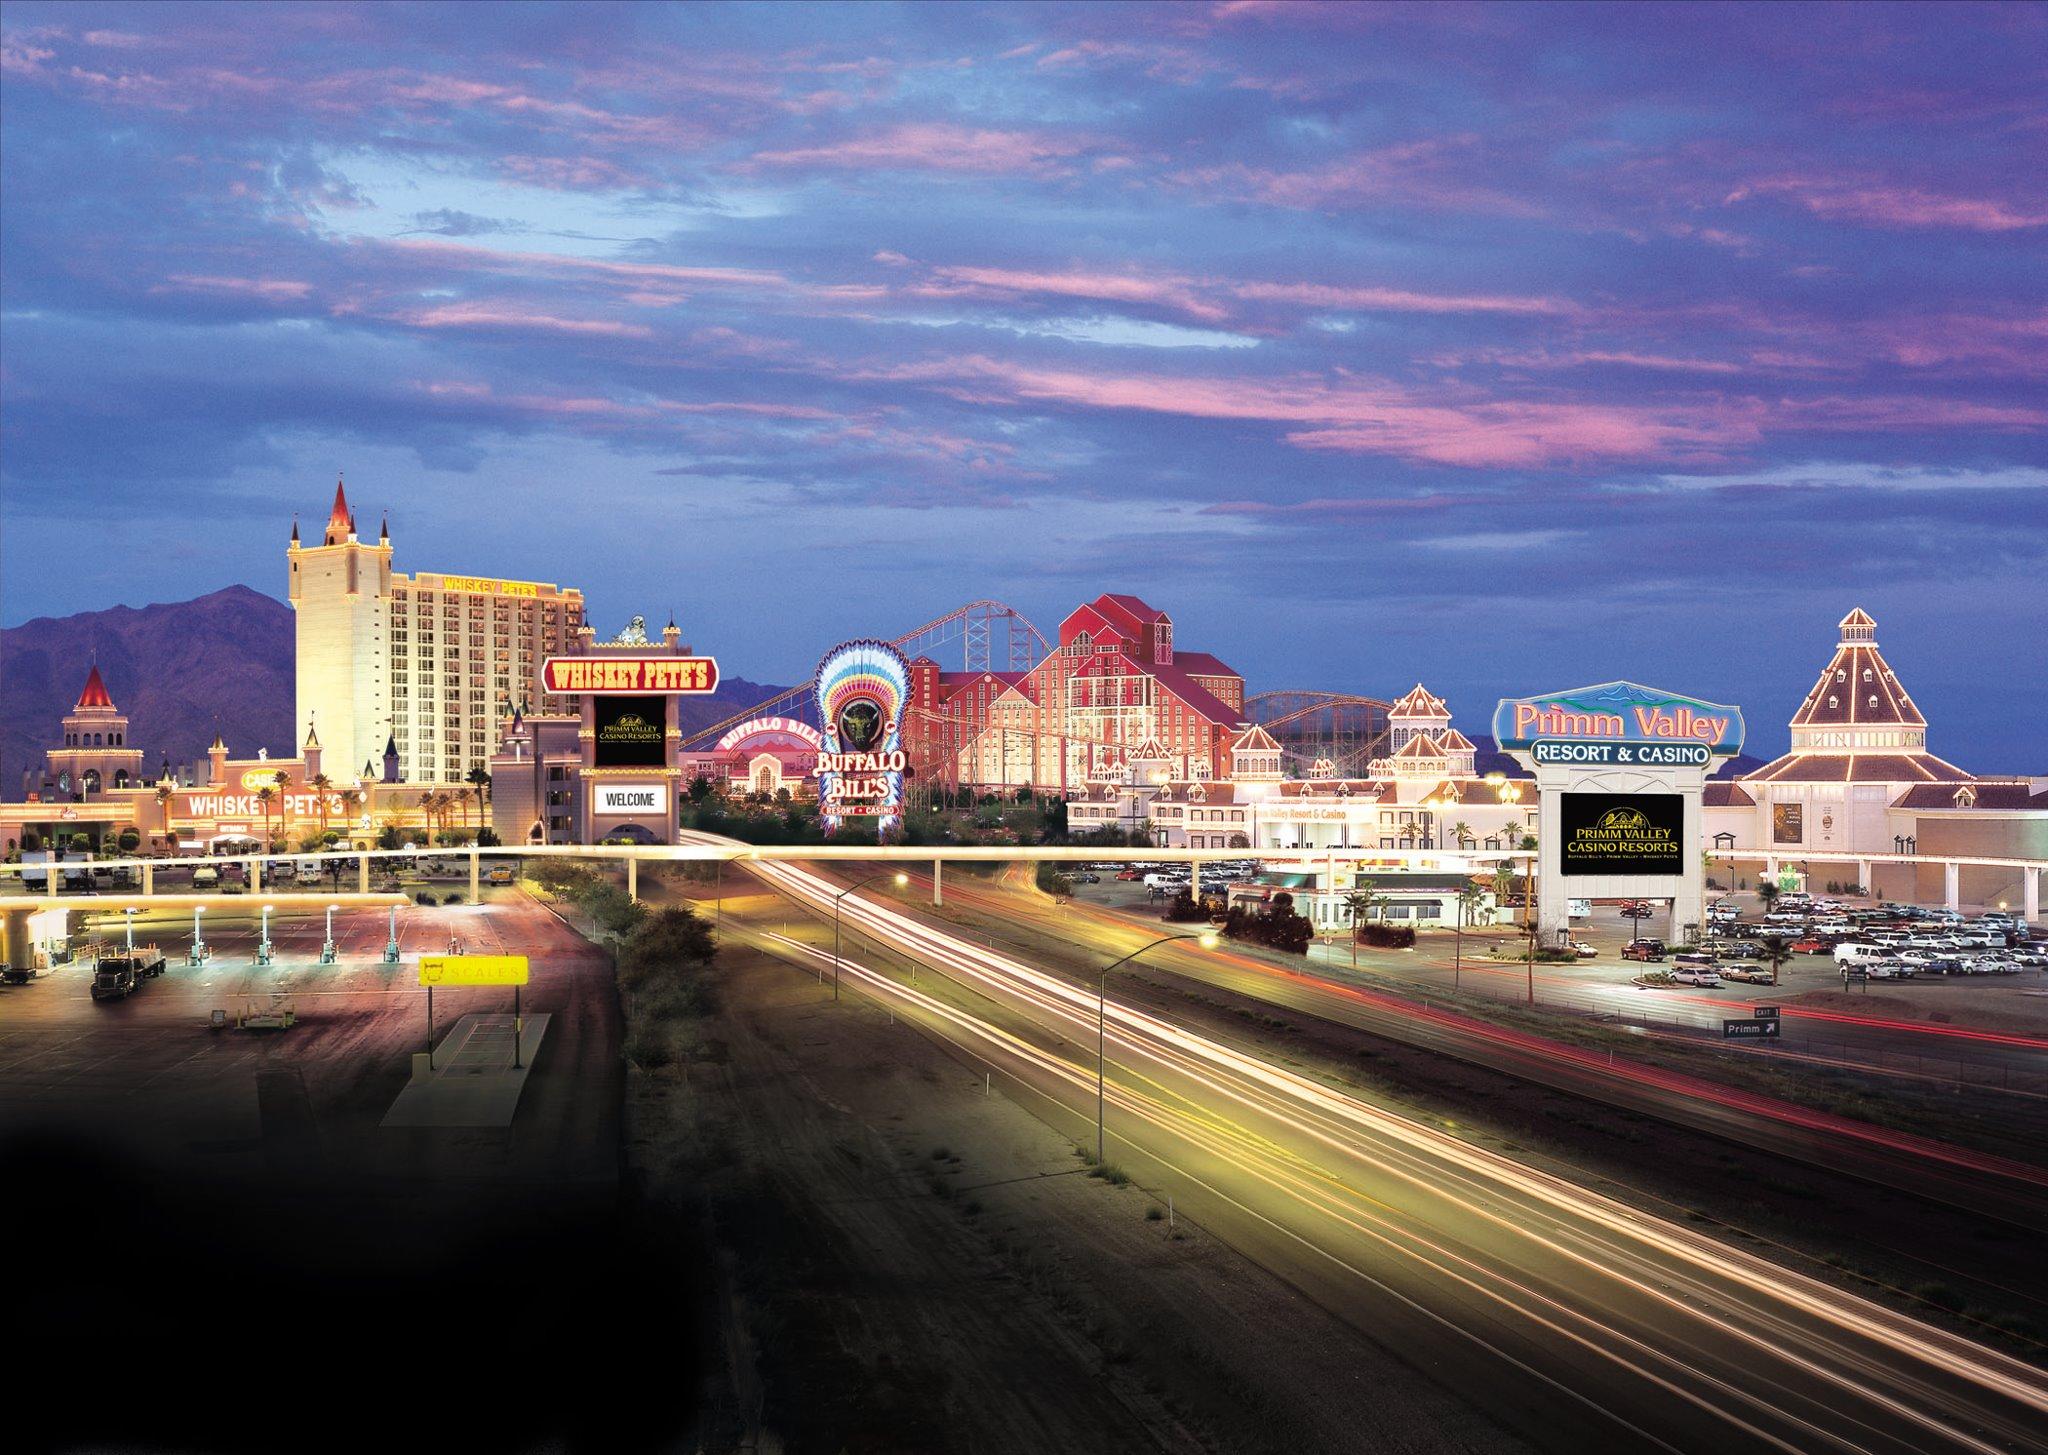 primm valley casino resorts usa j1 wiza work and travel summer program 2016 nevada iecenter (10)